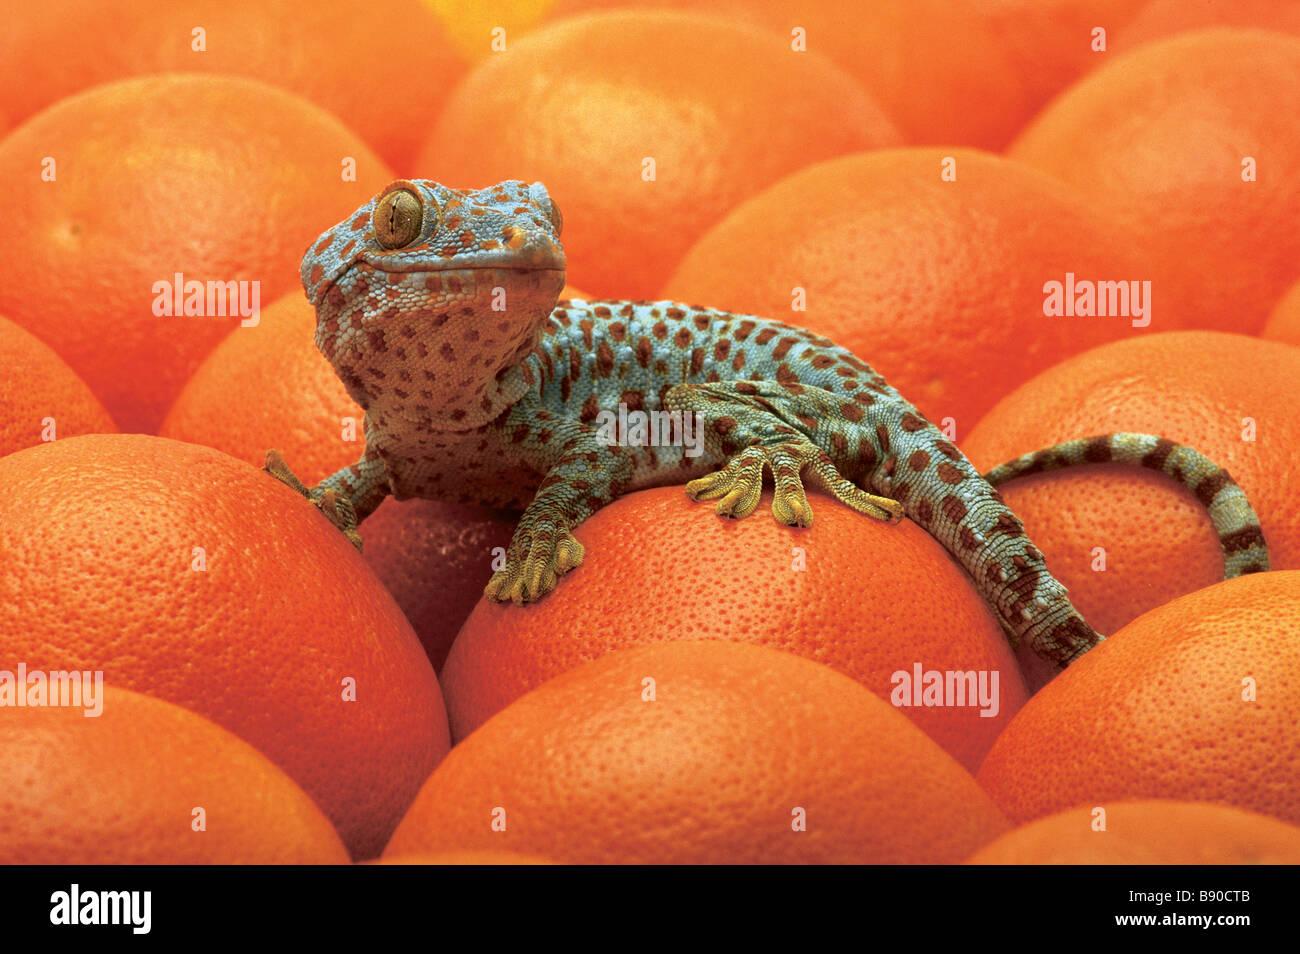 FL1179, Kitchin/Hurst; Lézard tacheté Oranges Photo Stock